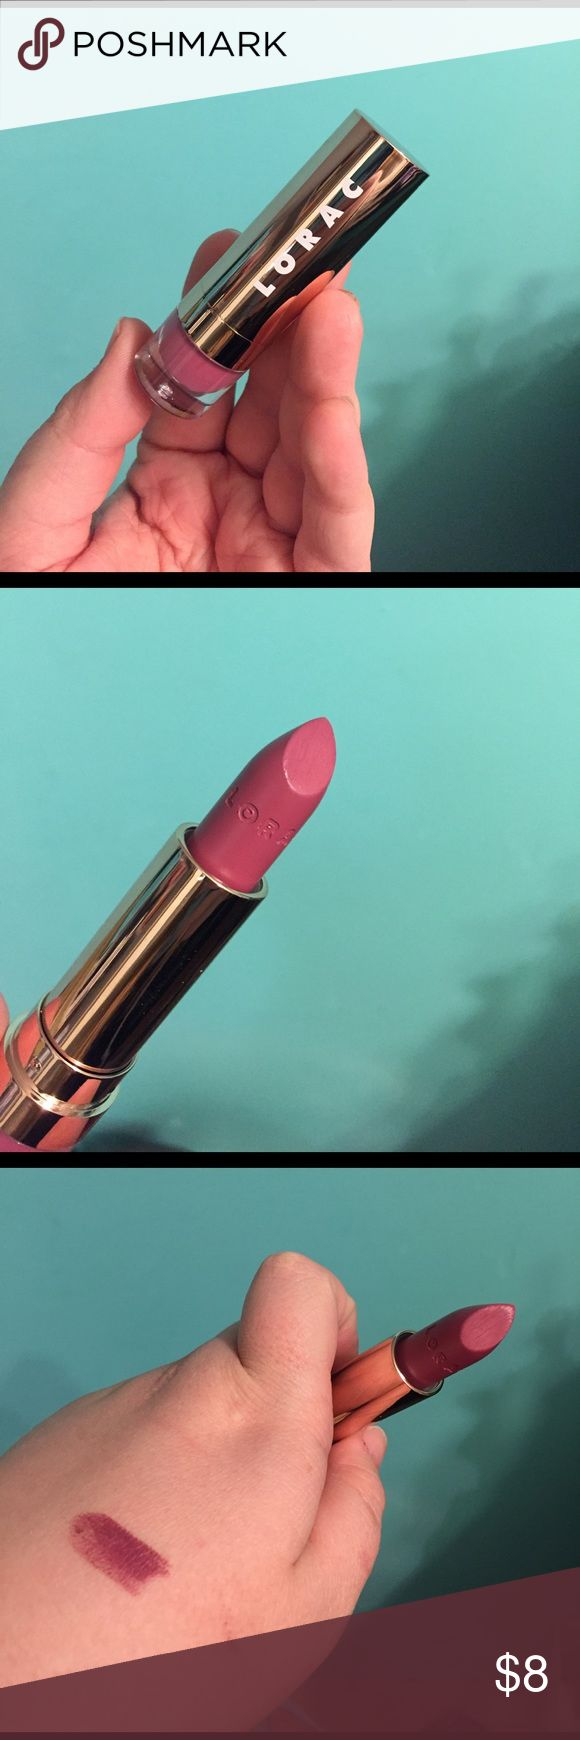 Lorac Alter Ego Lipstick in Stylist Lorac Alter Ego Lipstick in Stylist. New, only used for swatch. No box. Lorac Makeup Lipstick